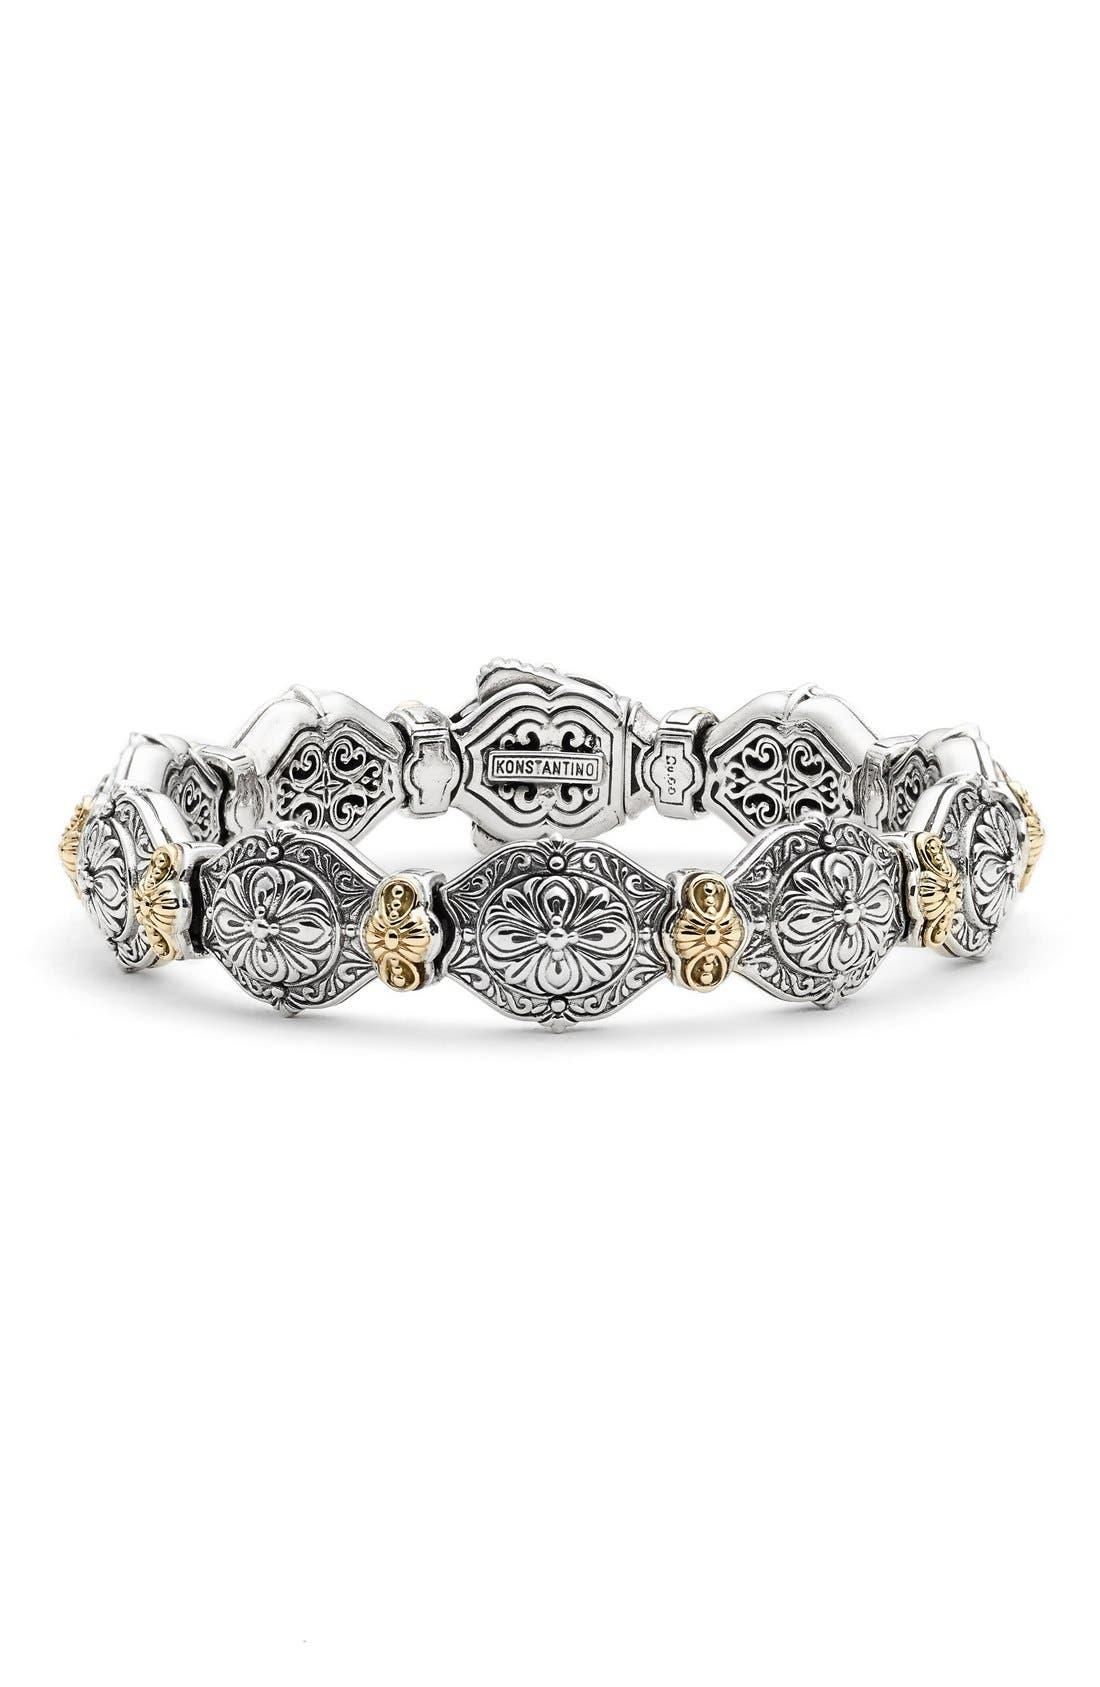 'Silver & Gold Classics' Link Bracelet,                             Main thumbnail 1, color,                             SILVER/ GOLD